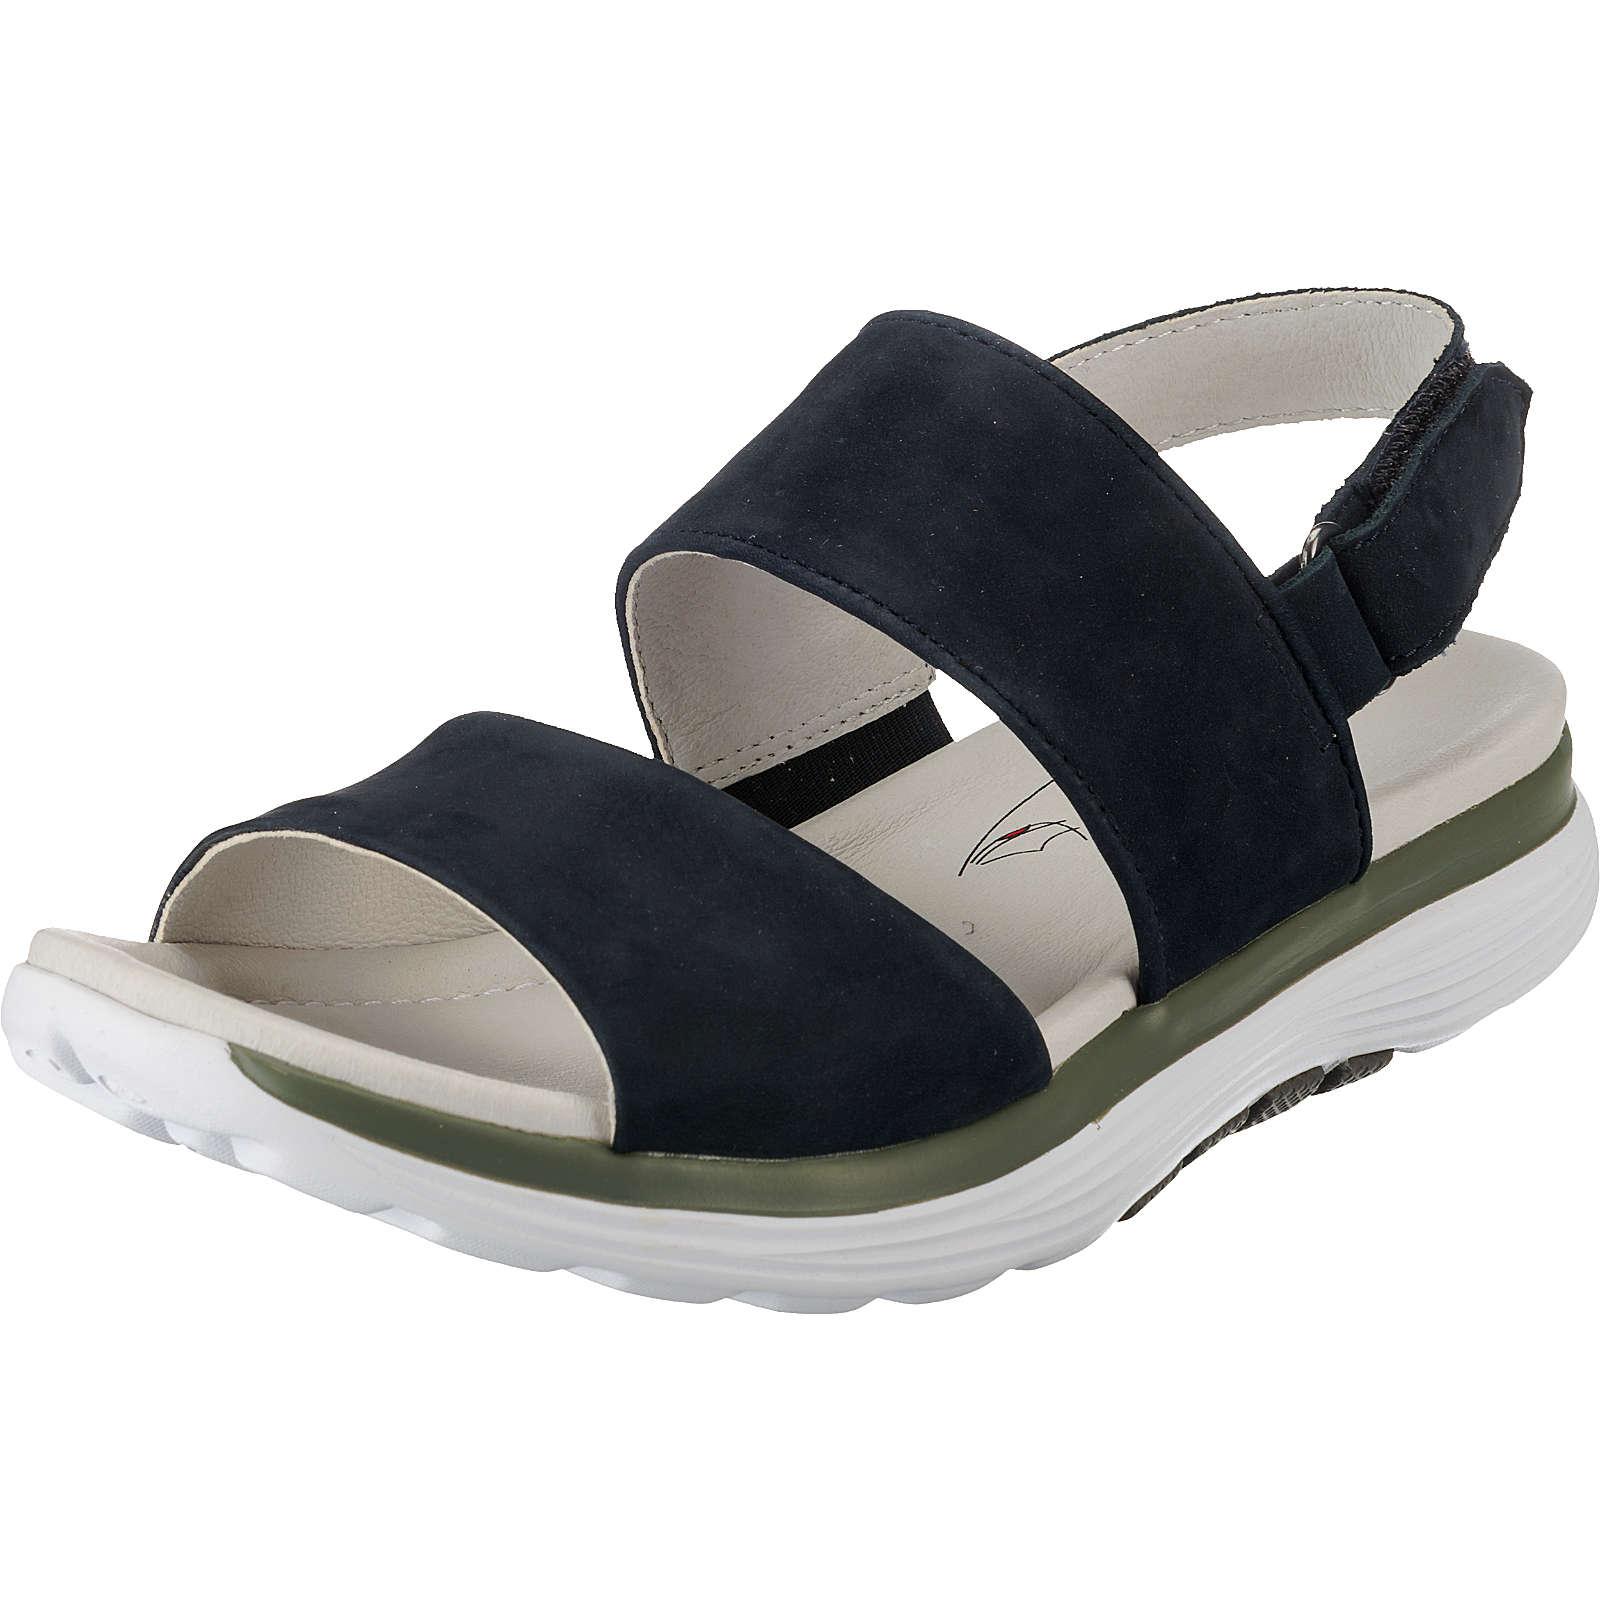 Gabor Klassische Sandalen blau Damen Gr. 38